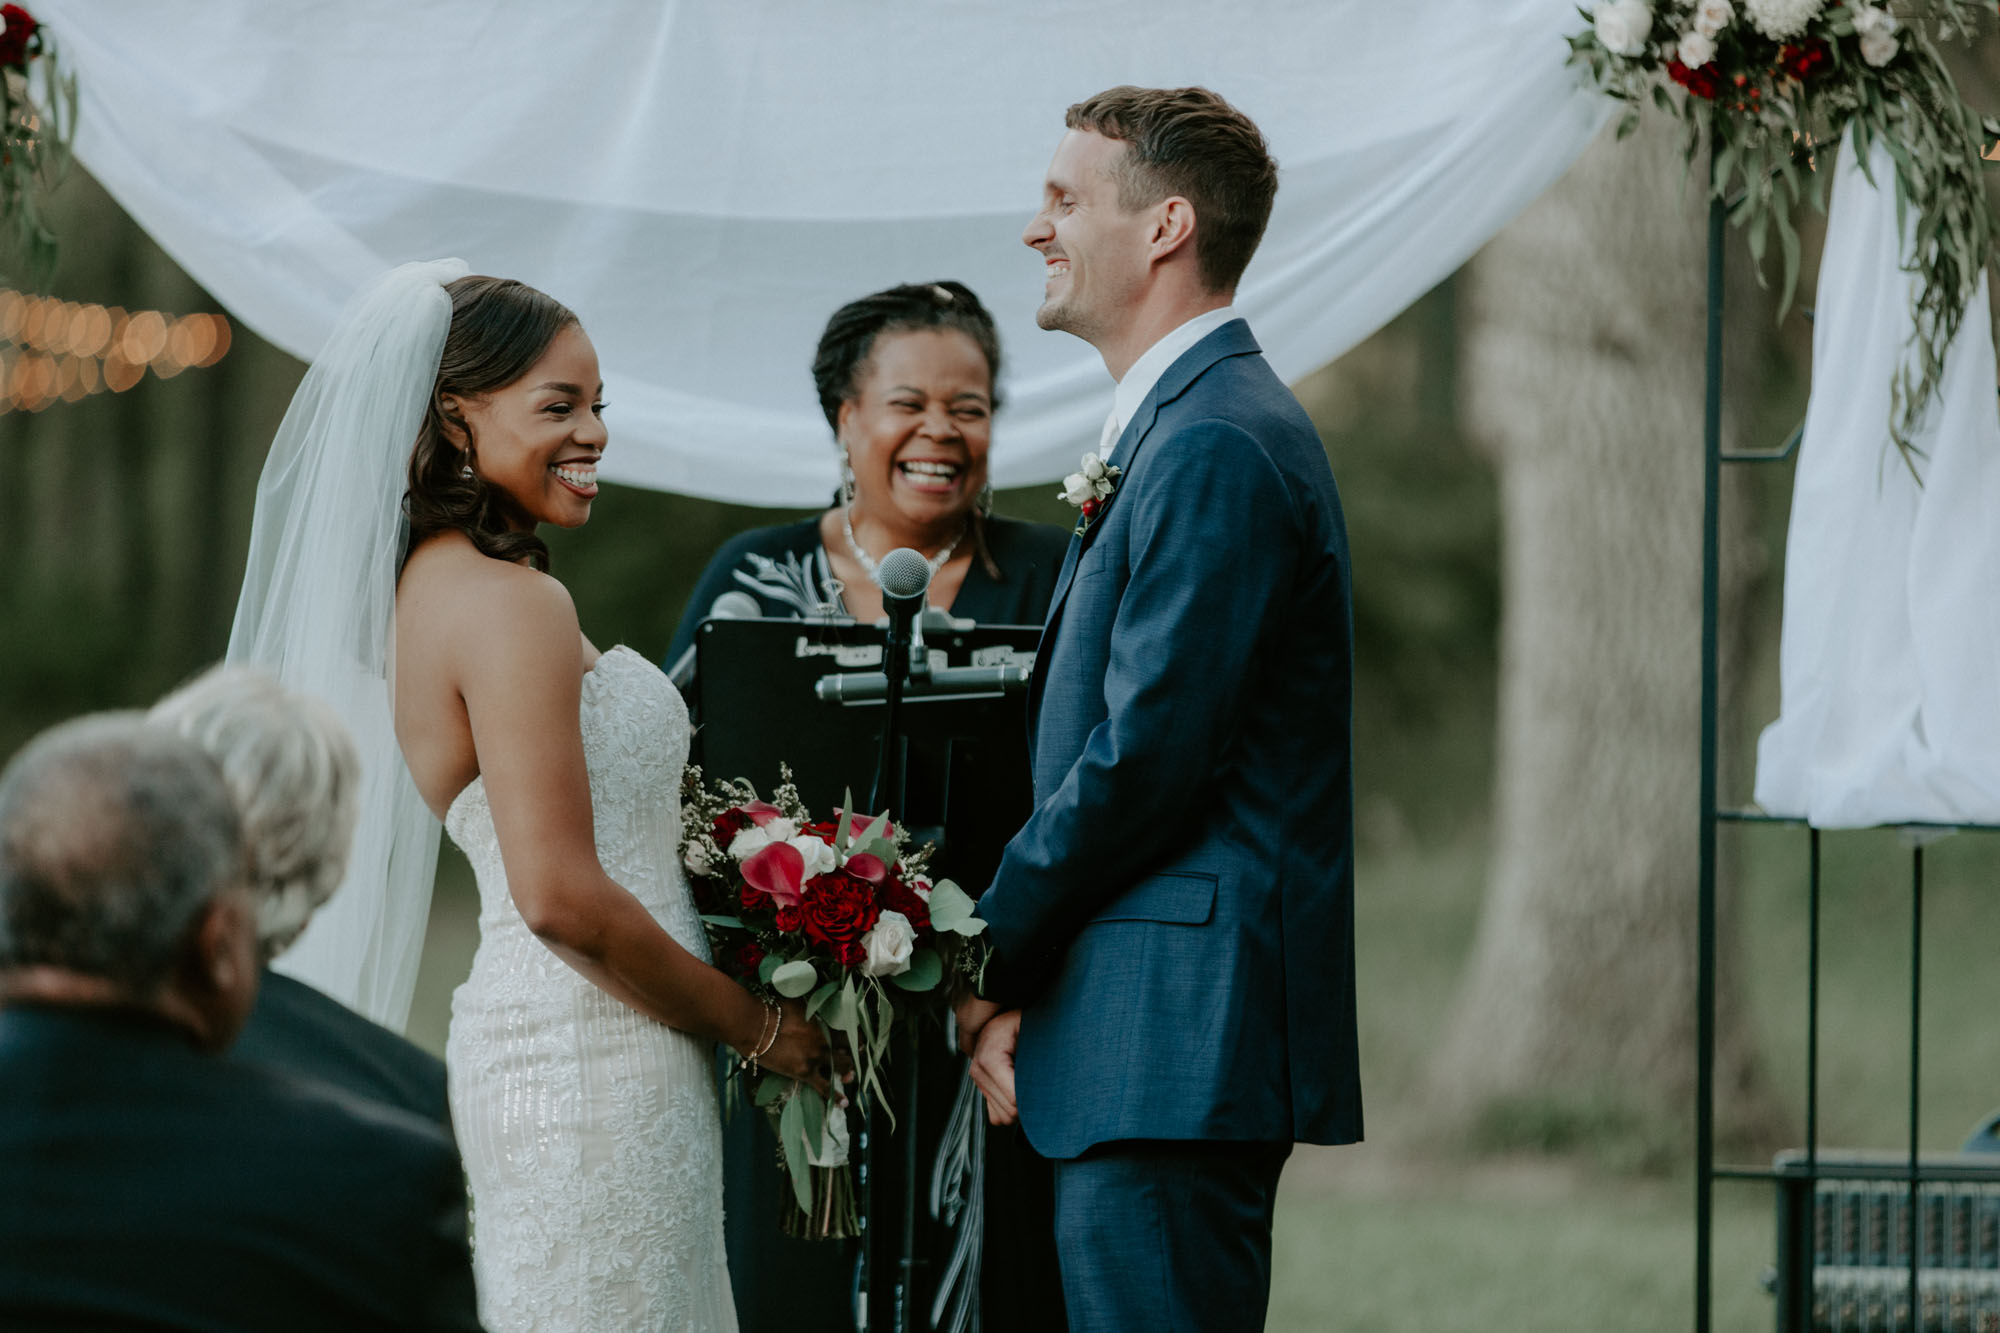 prairie_glass_house_wedding_champaign_wright_photographs_simon_0083.jpg